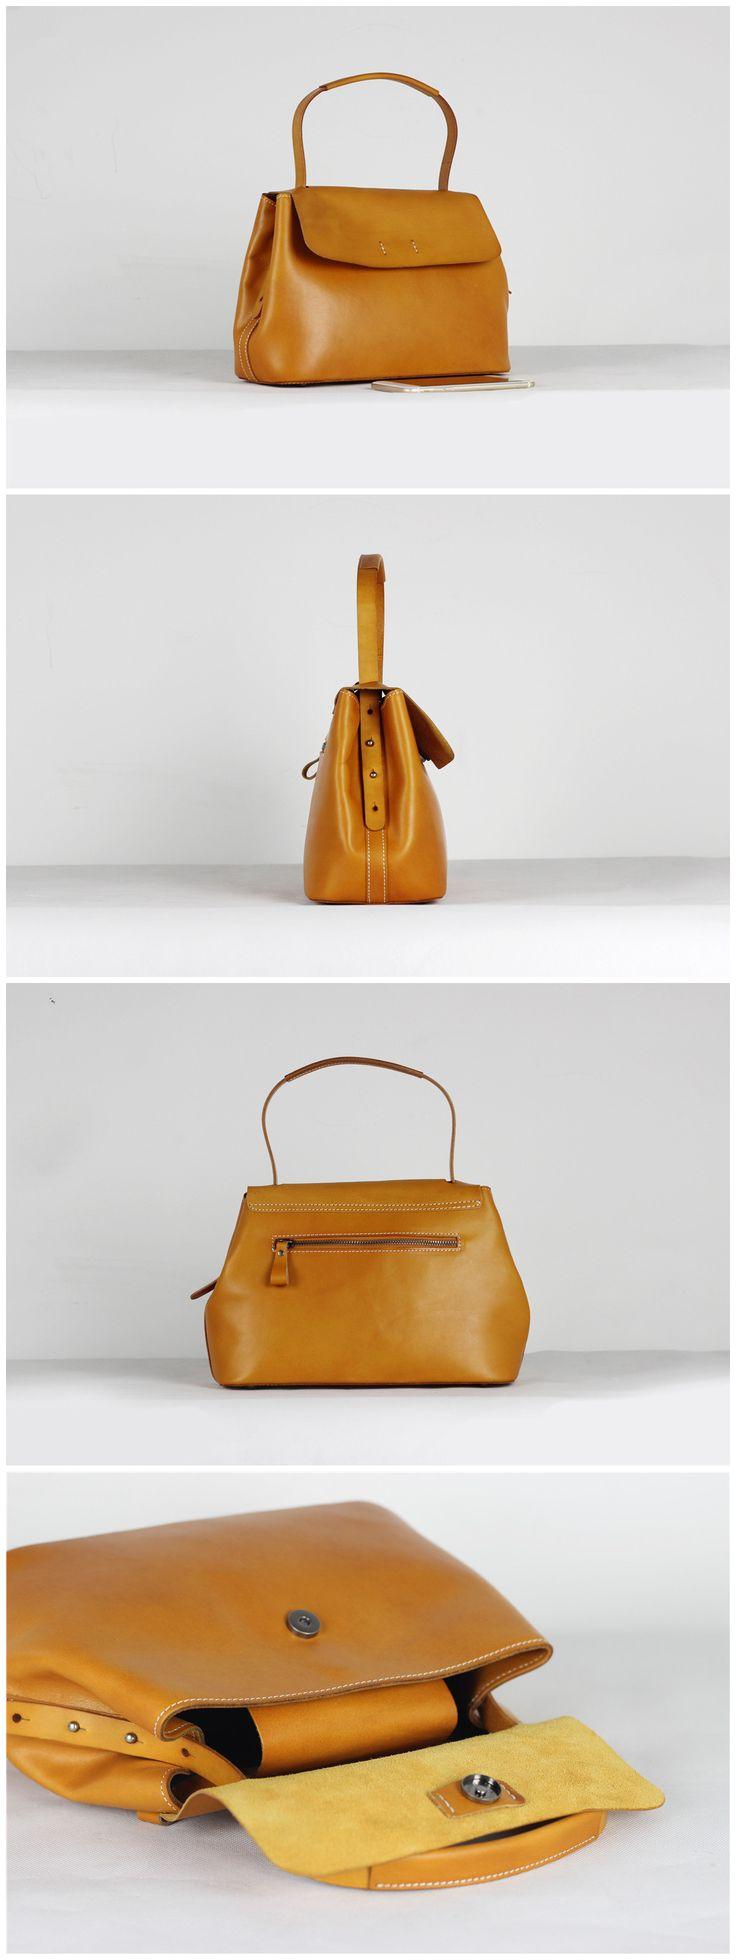 Genuine Leather Tote Bag Women Handbag